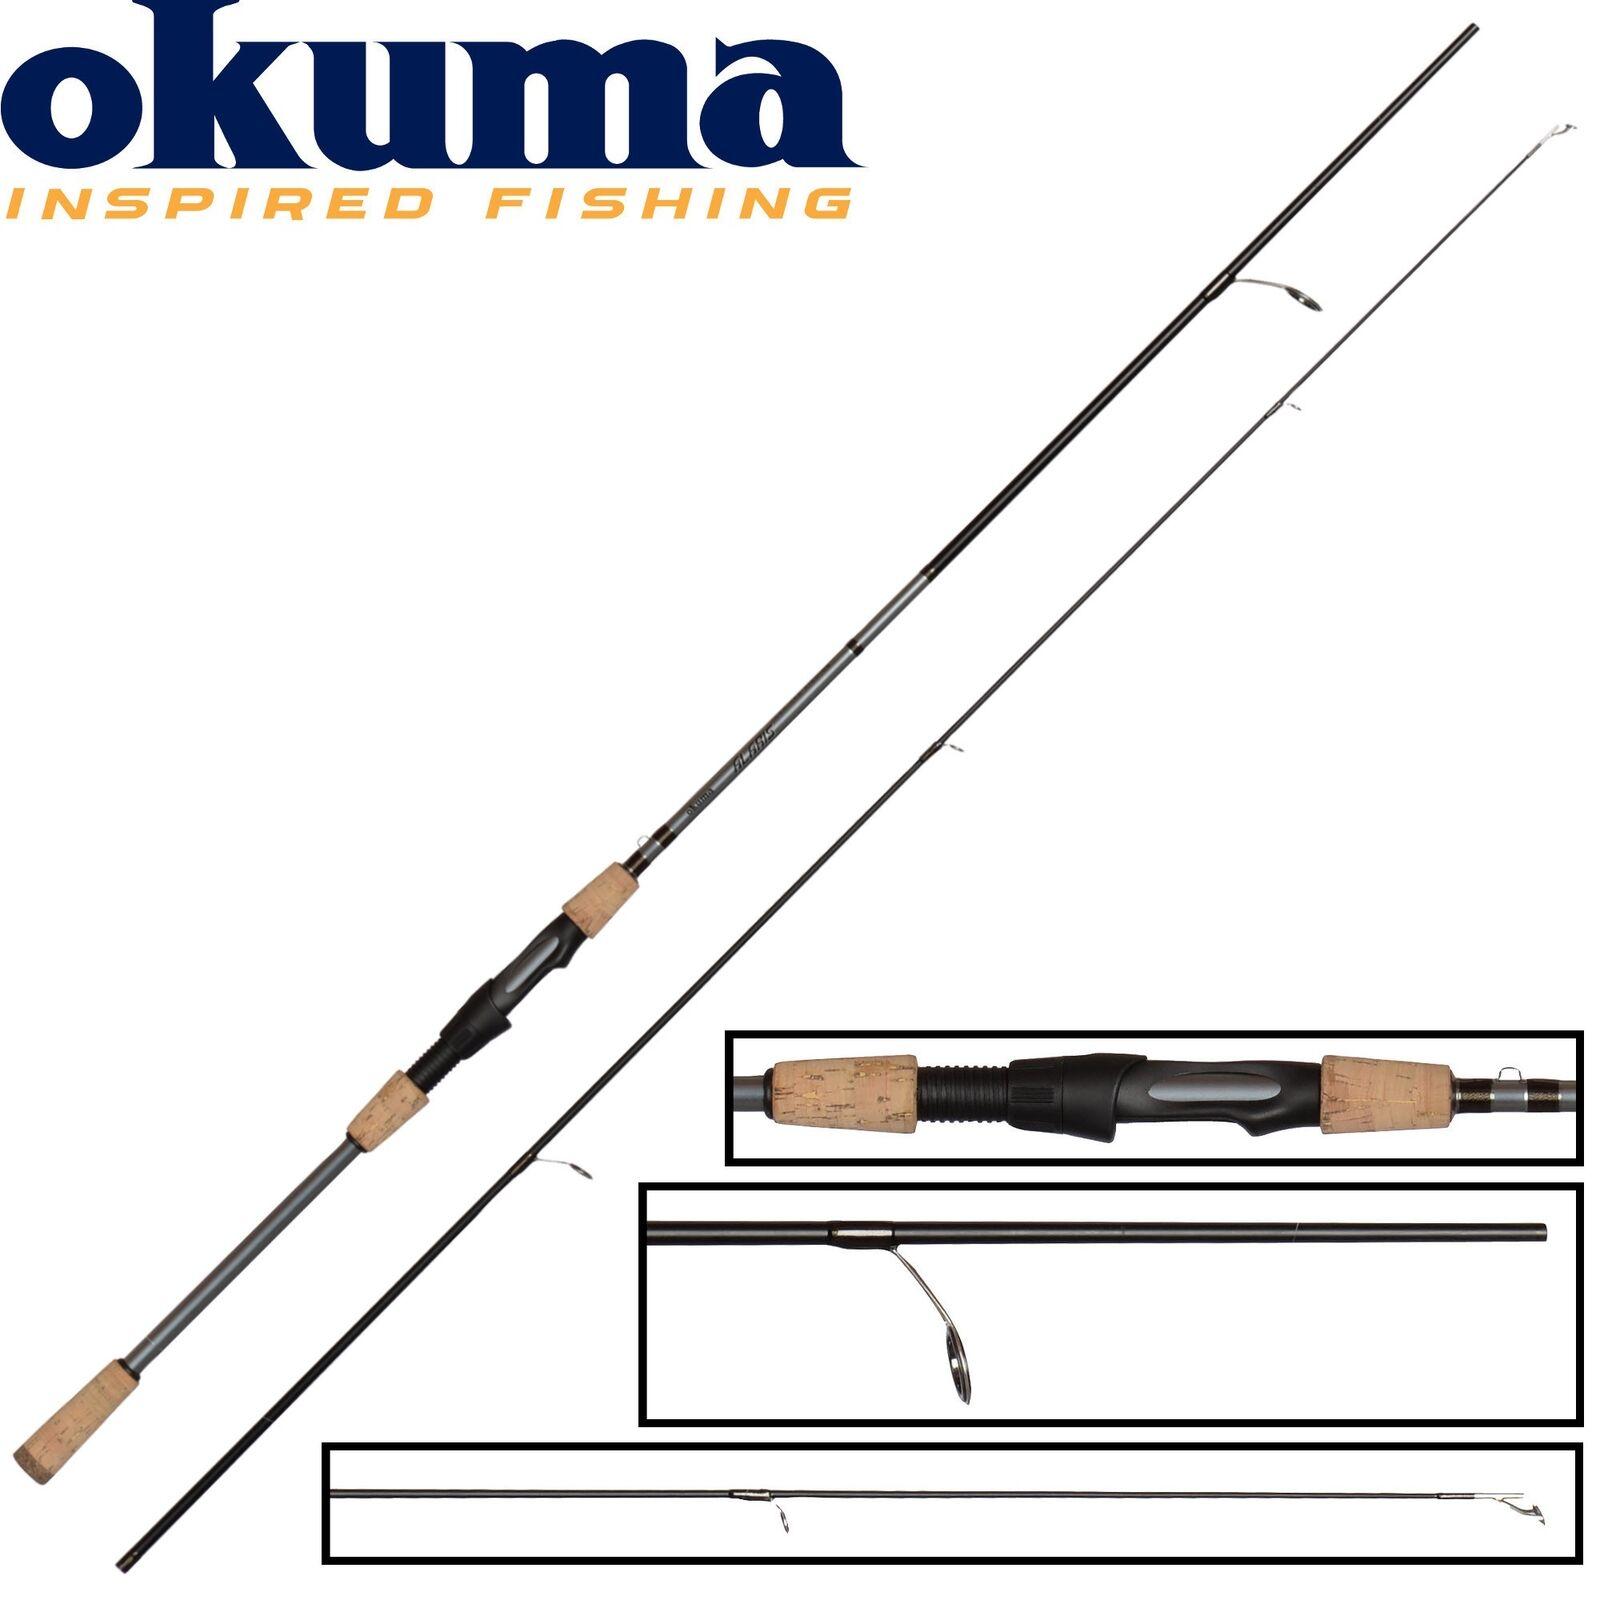 Okuma Okuma Okuma Alaris Spin 213cm 10-32g - Spinnrute, Raubfischrute, Angelrute, Spinnangel 6c290c